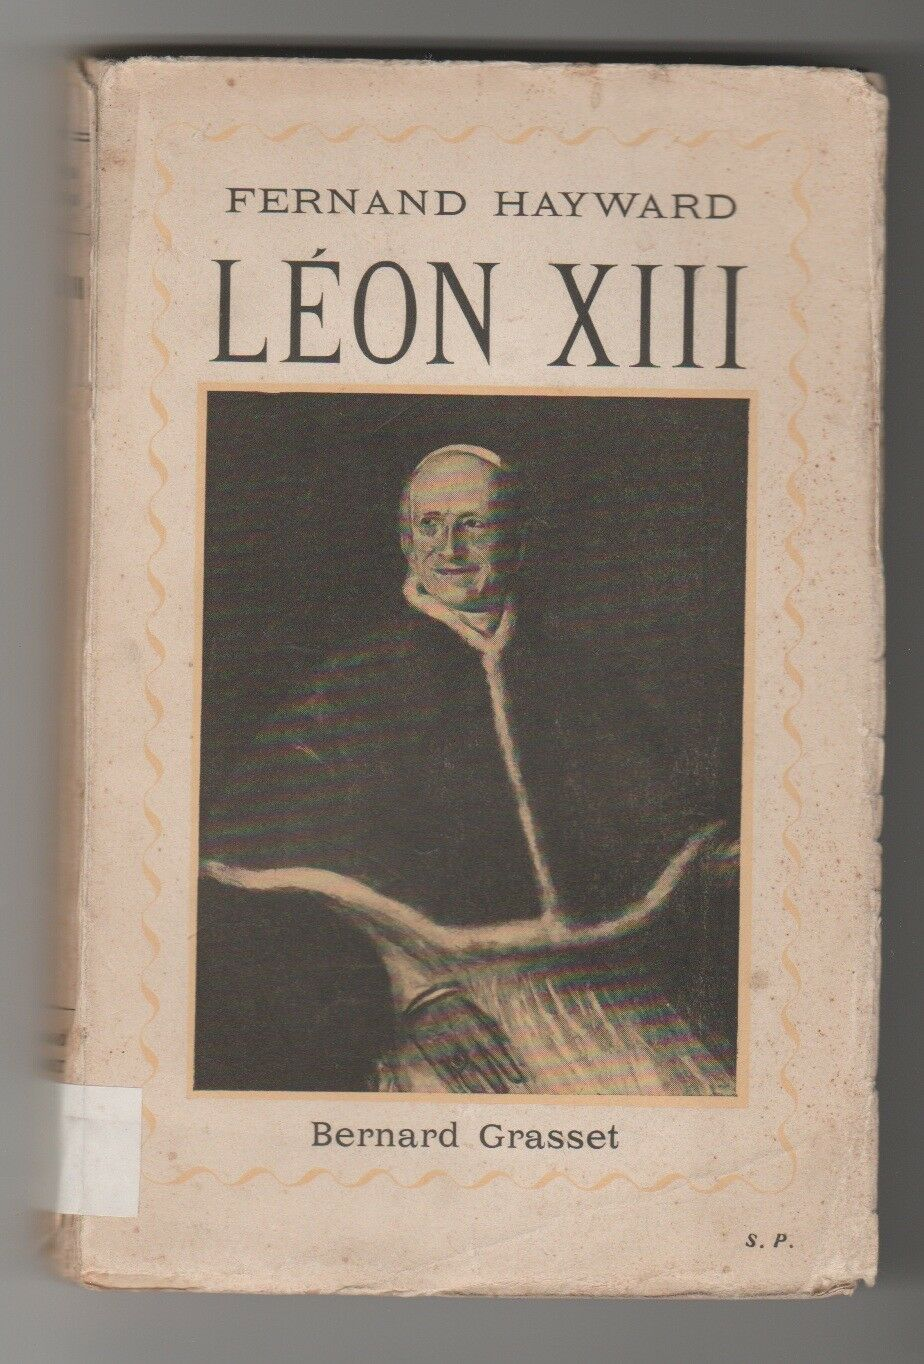 Leon XIII - (testo in francese)